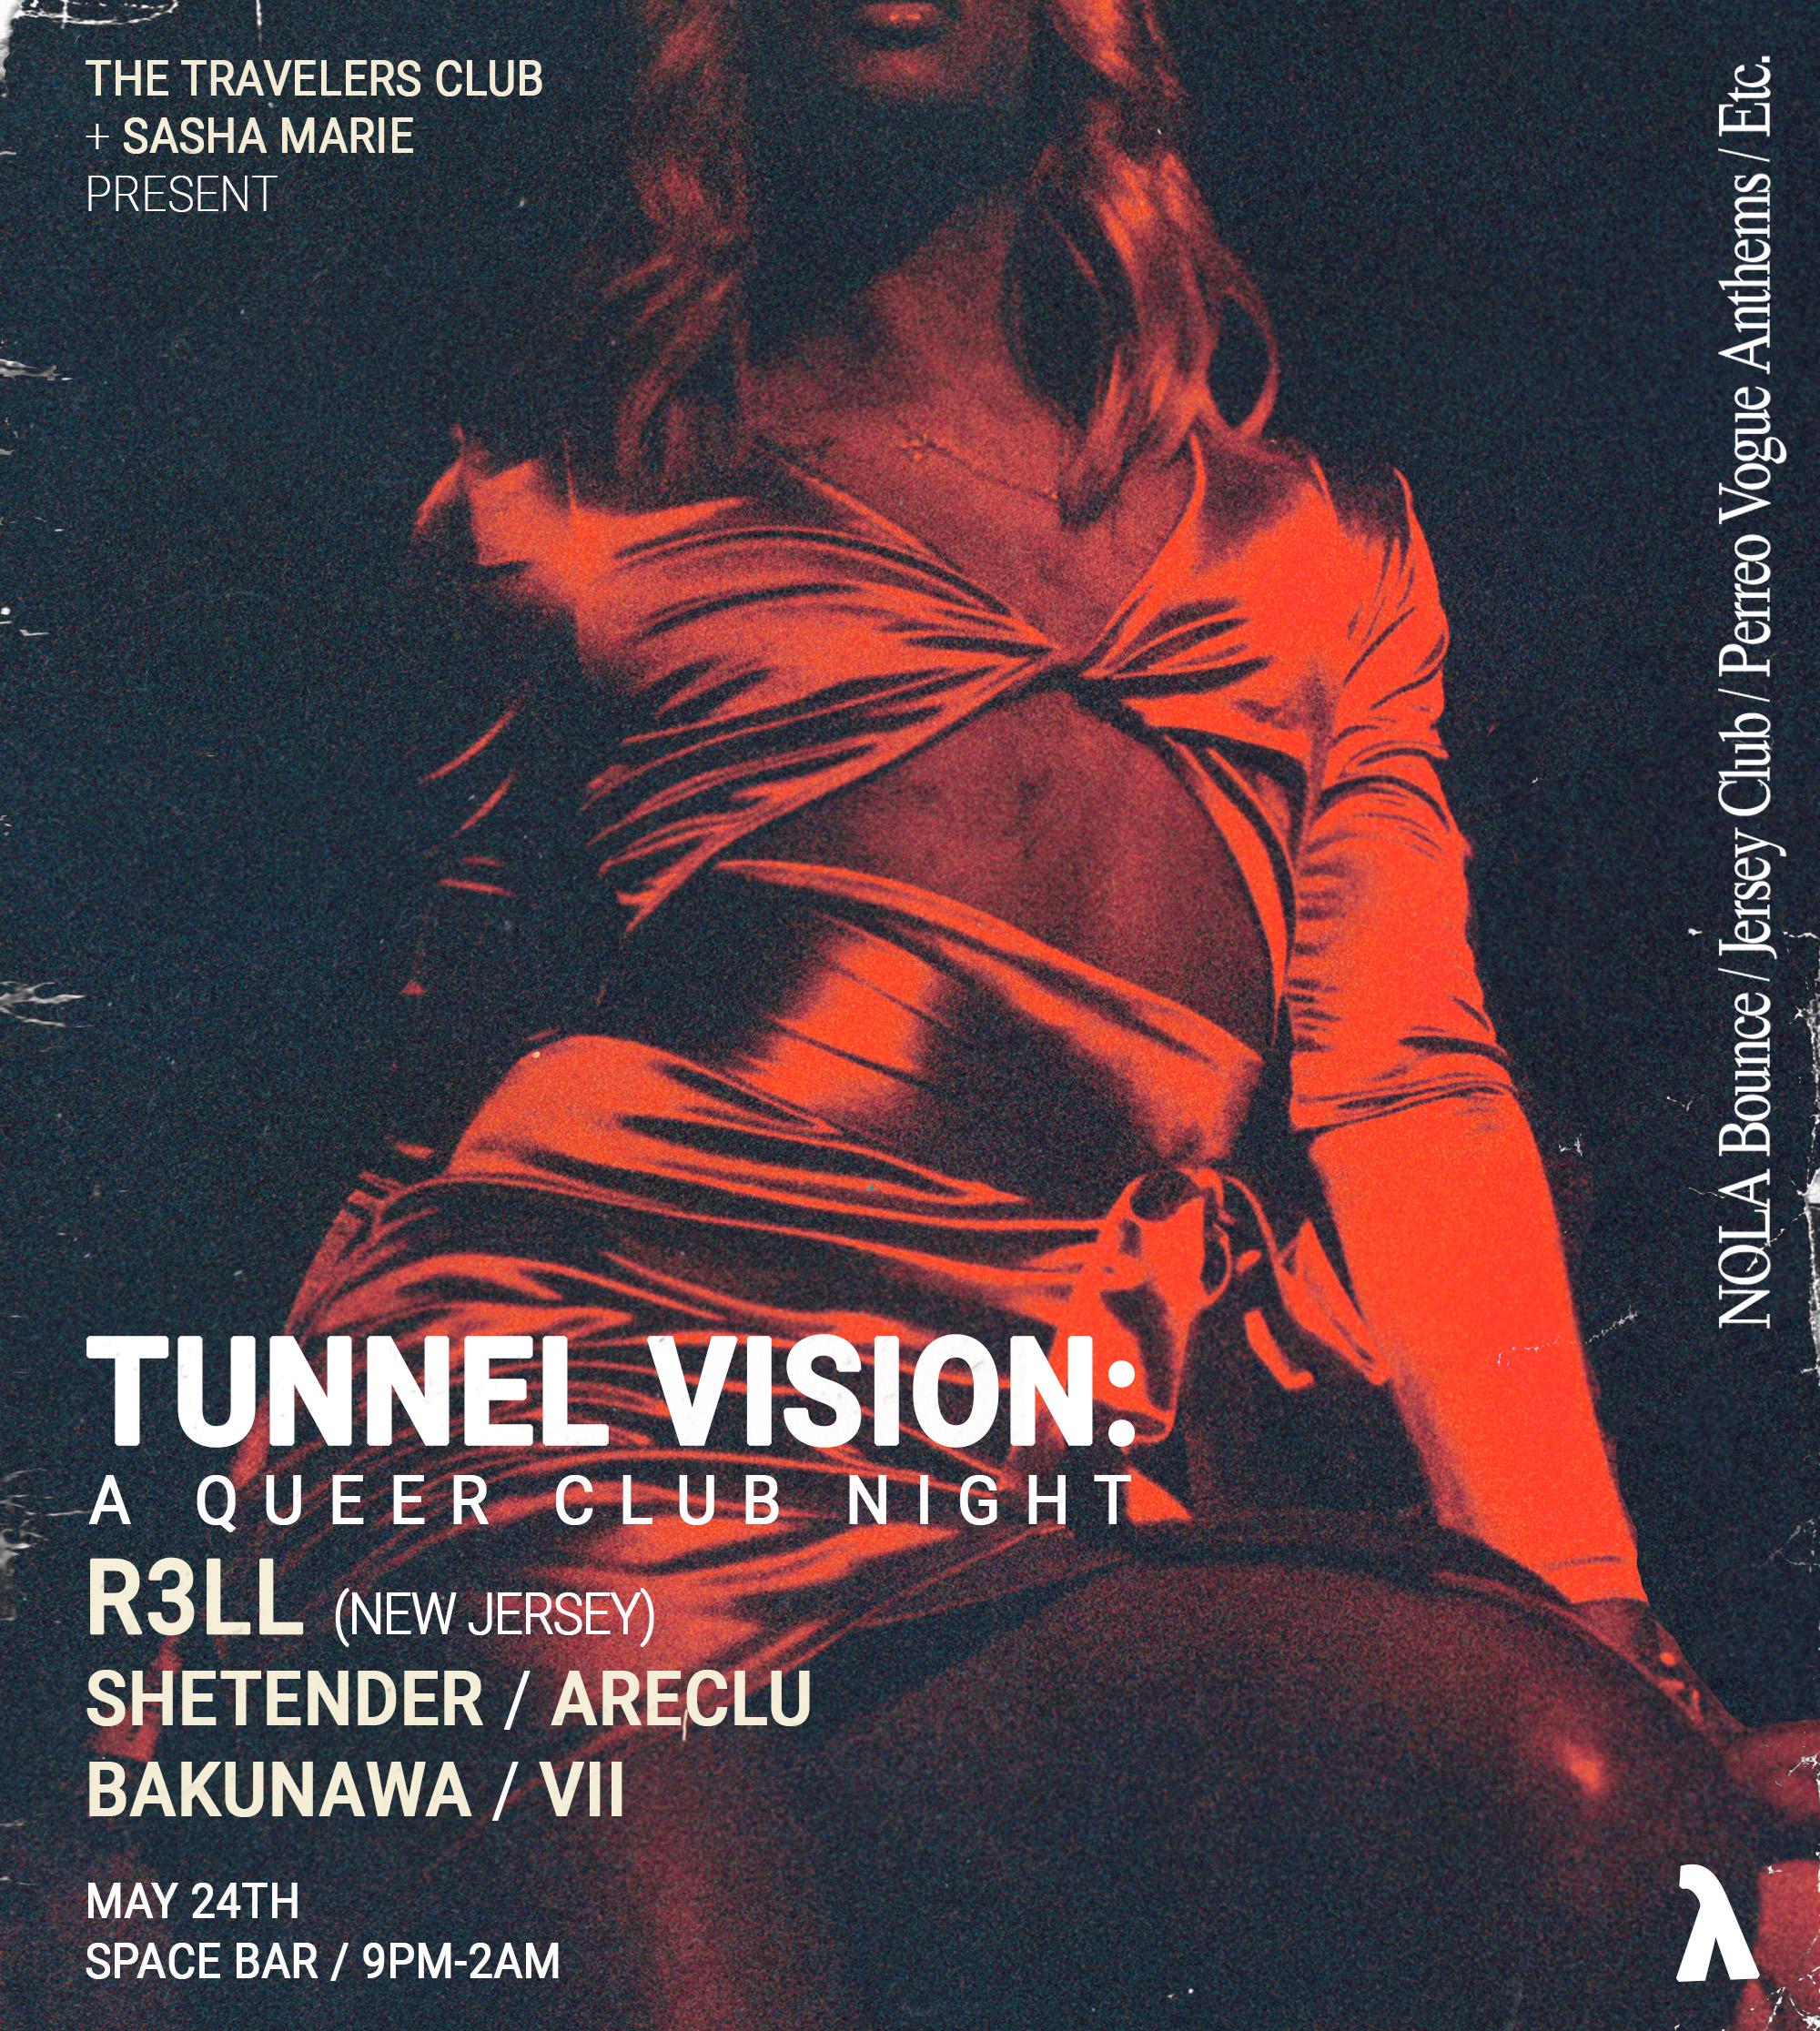 Tunnel Vision - R3LL